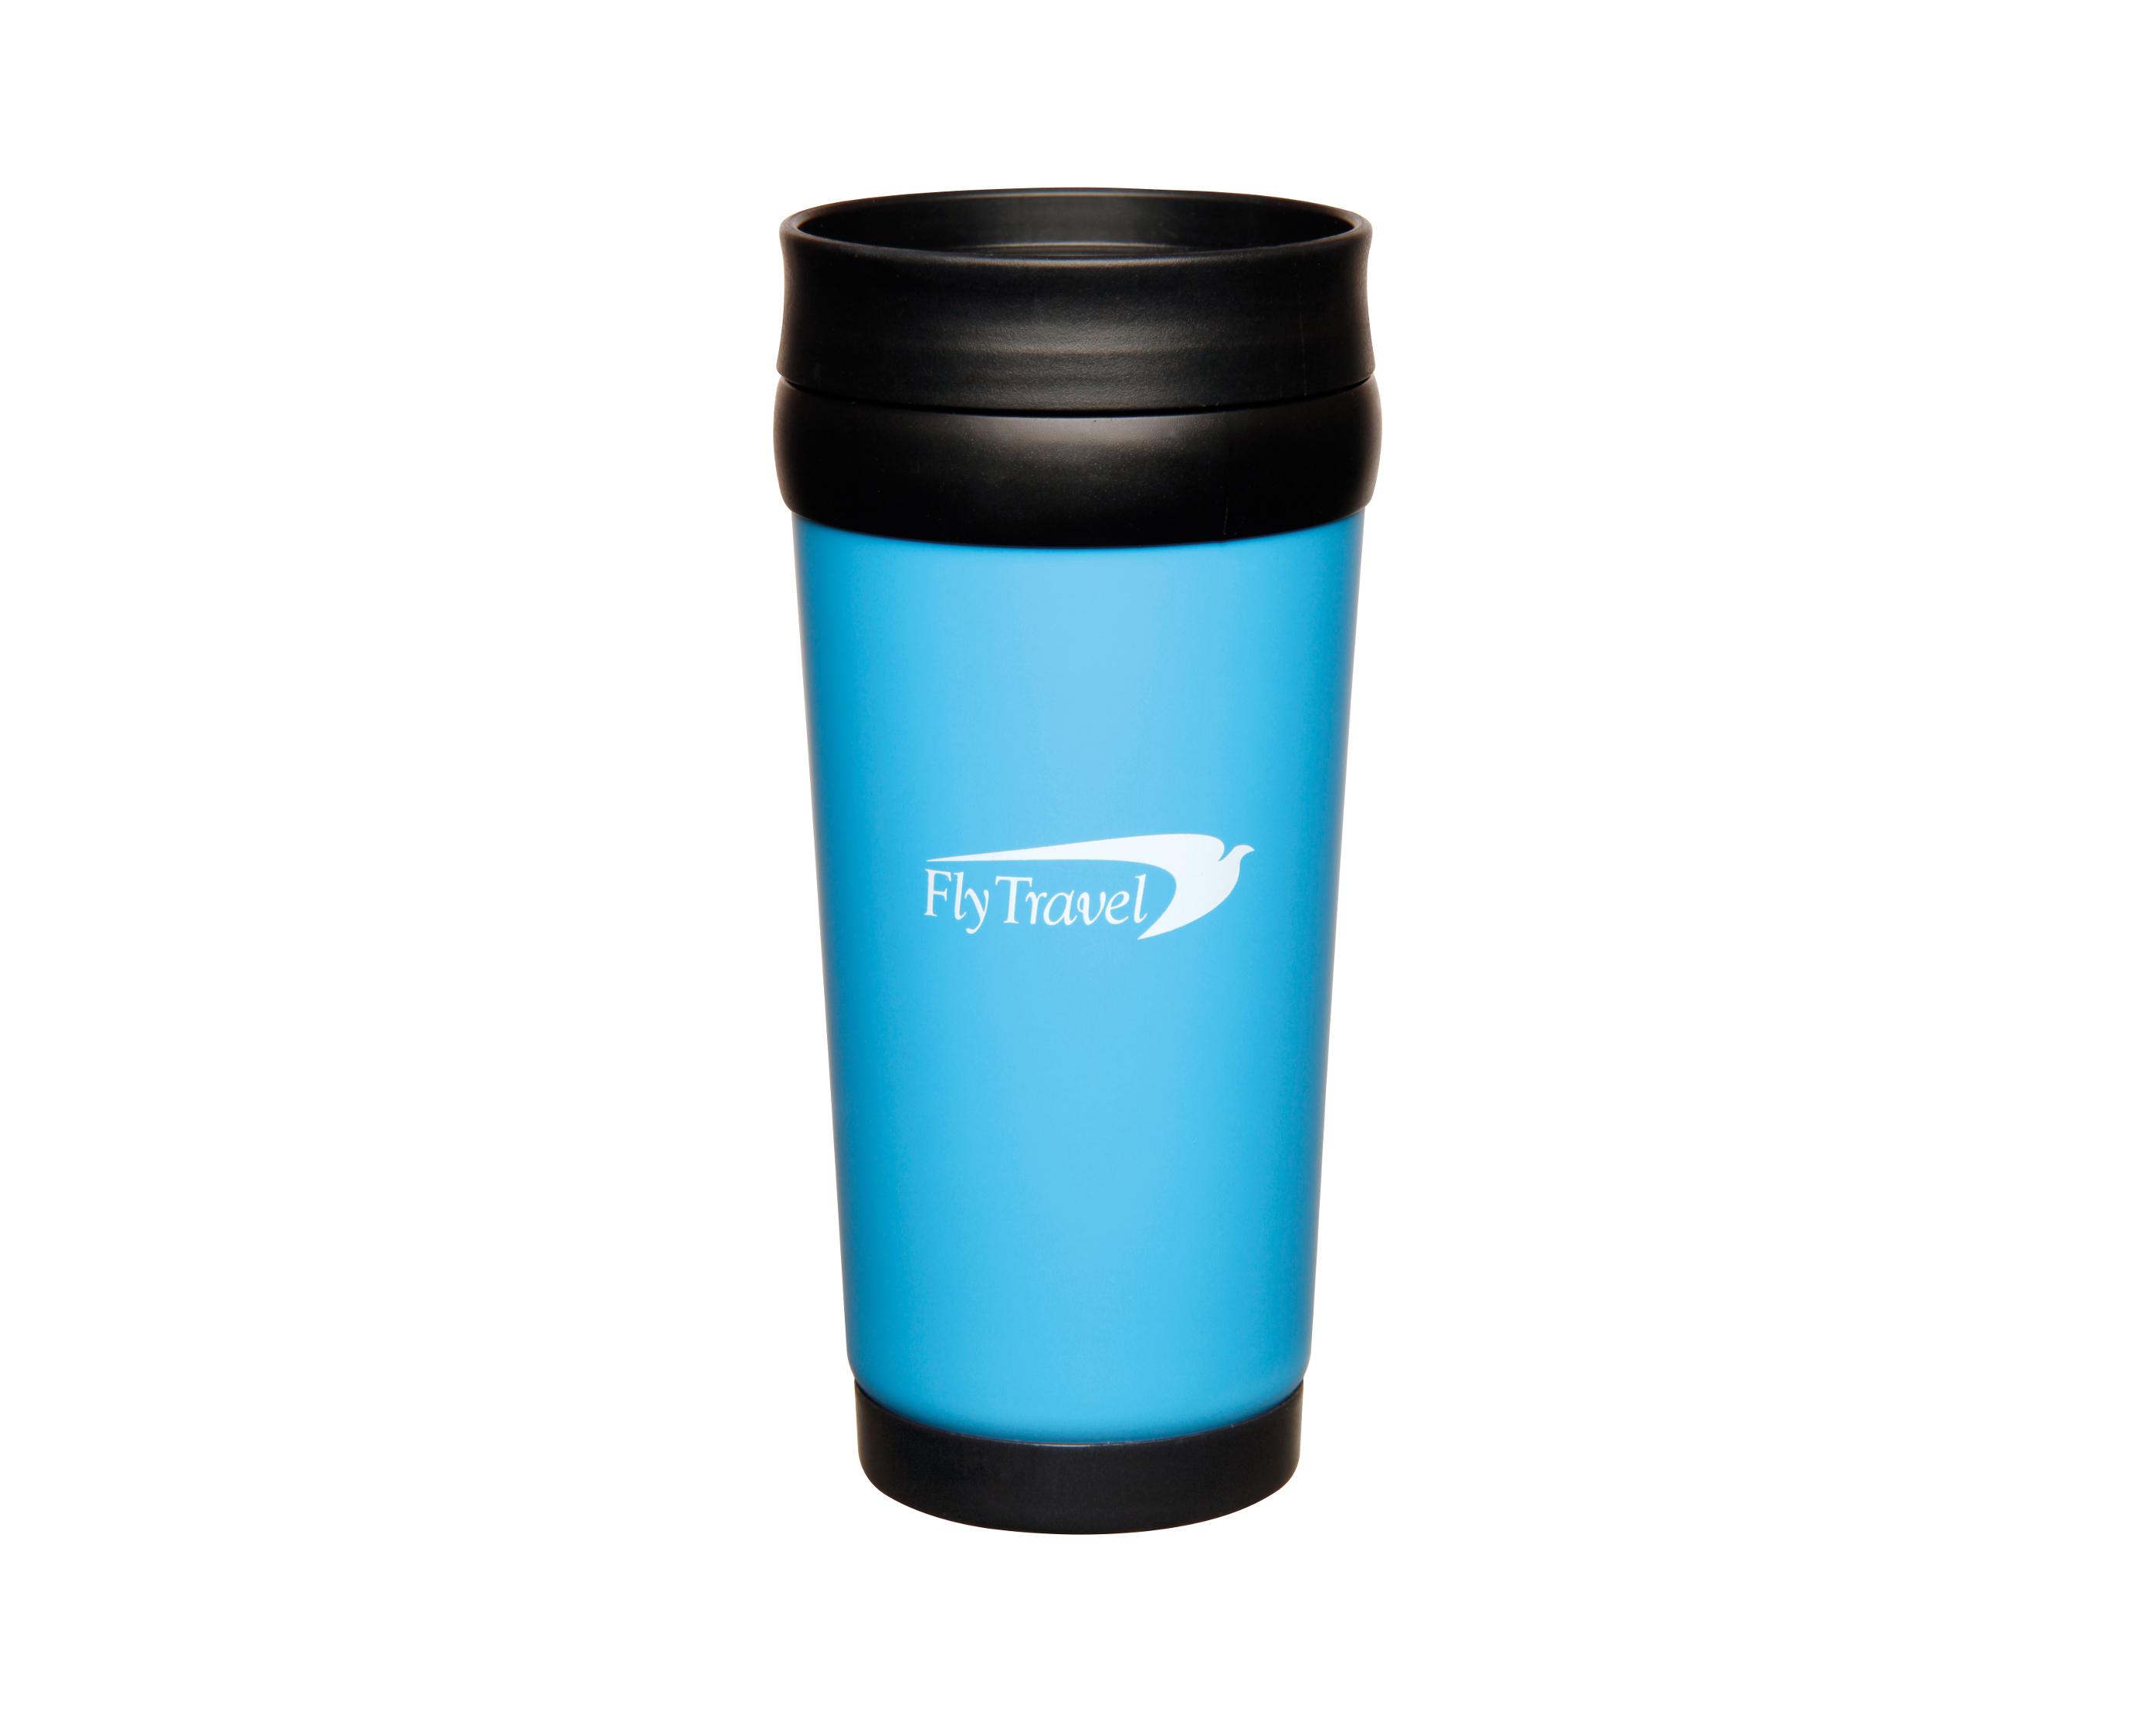 branded travel mugs express corporate promotional products delivered fast. Black Bedroom Furniture Sets. Home Design Ideas